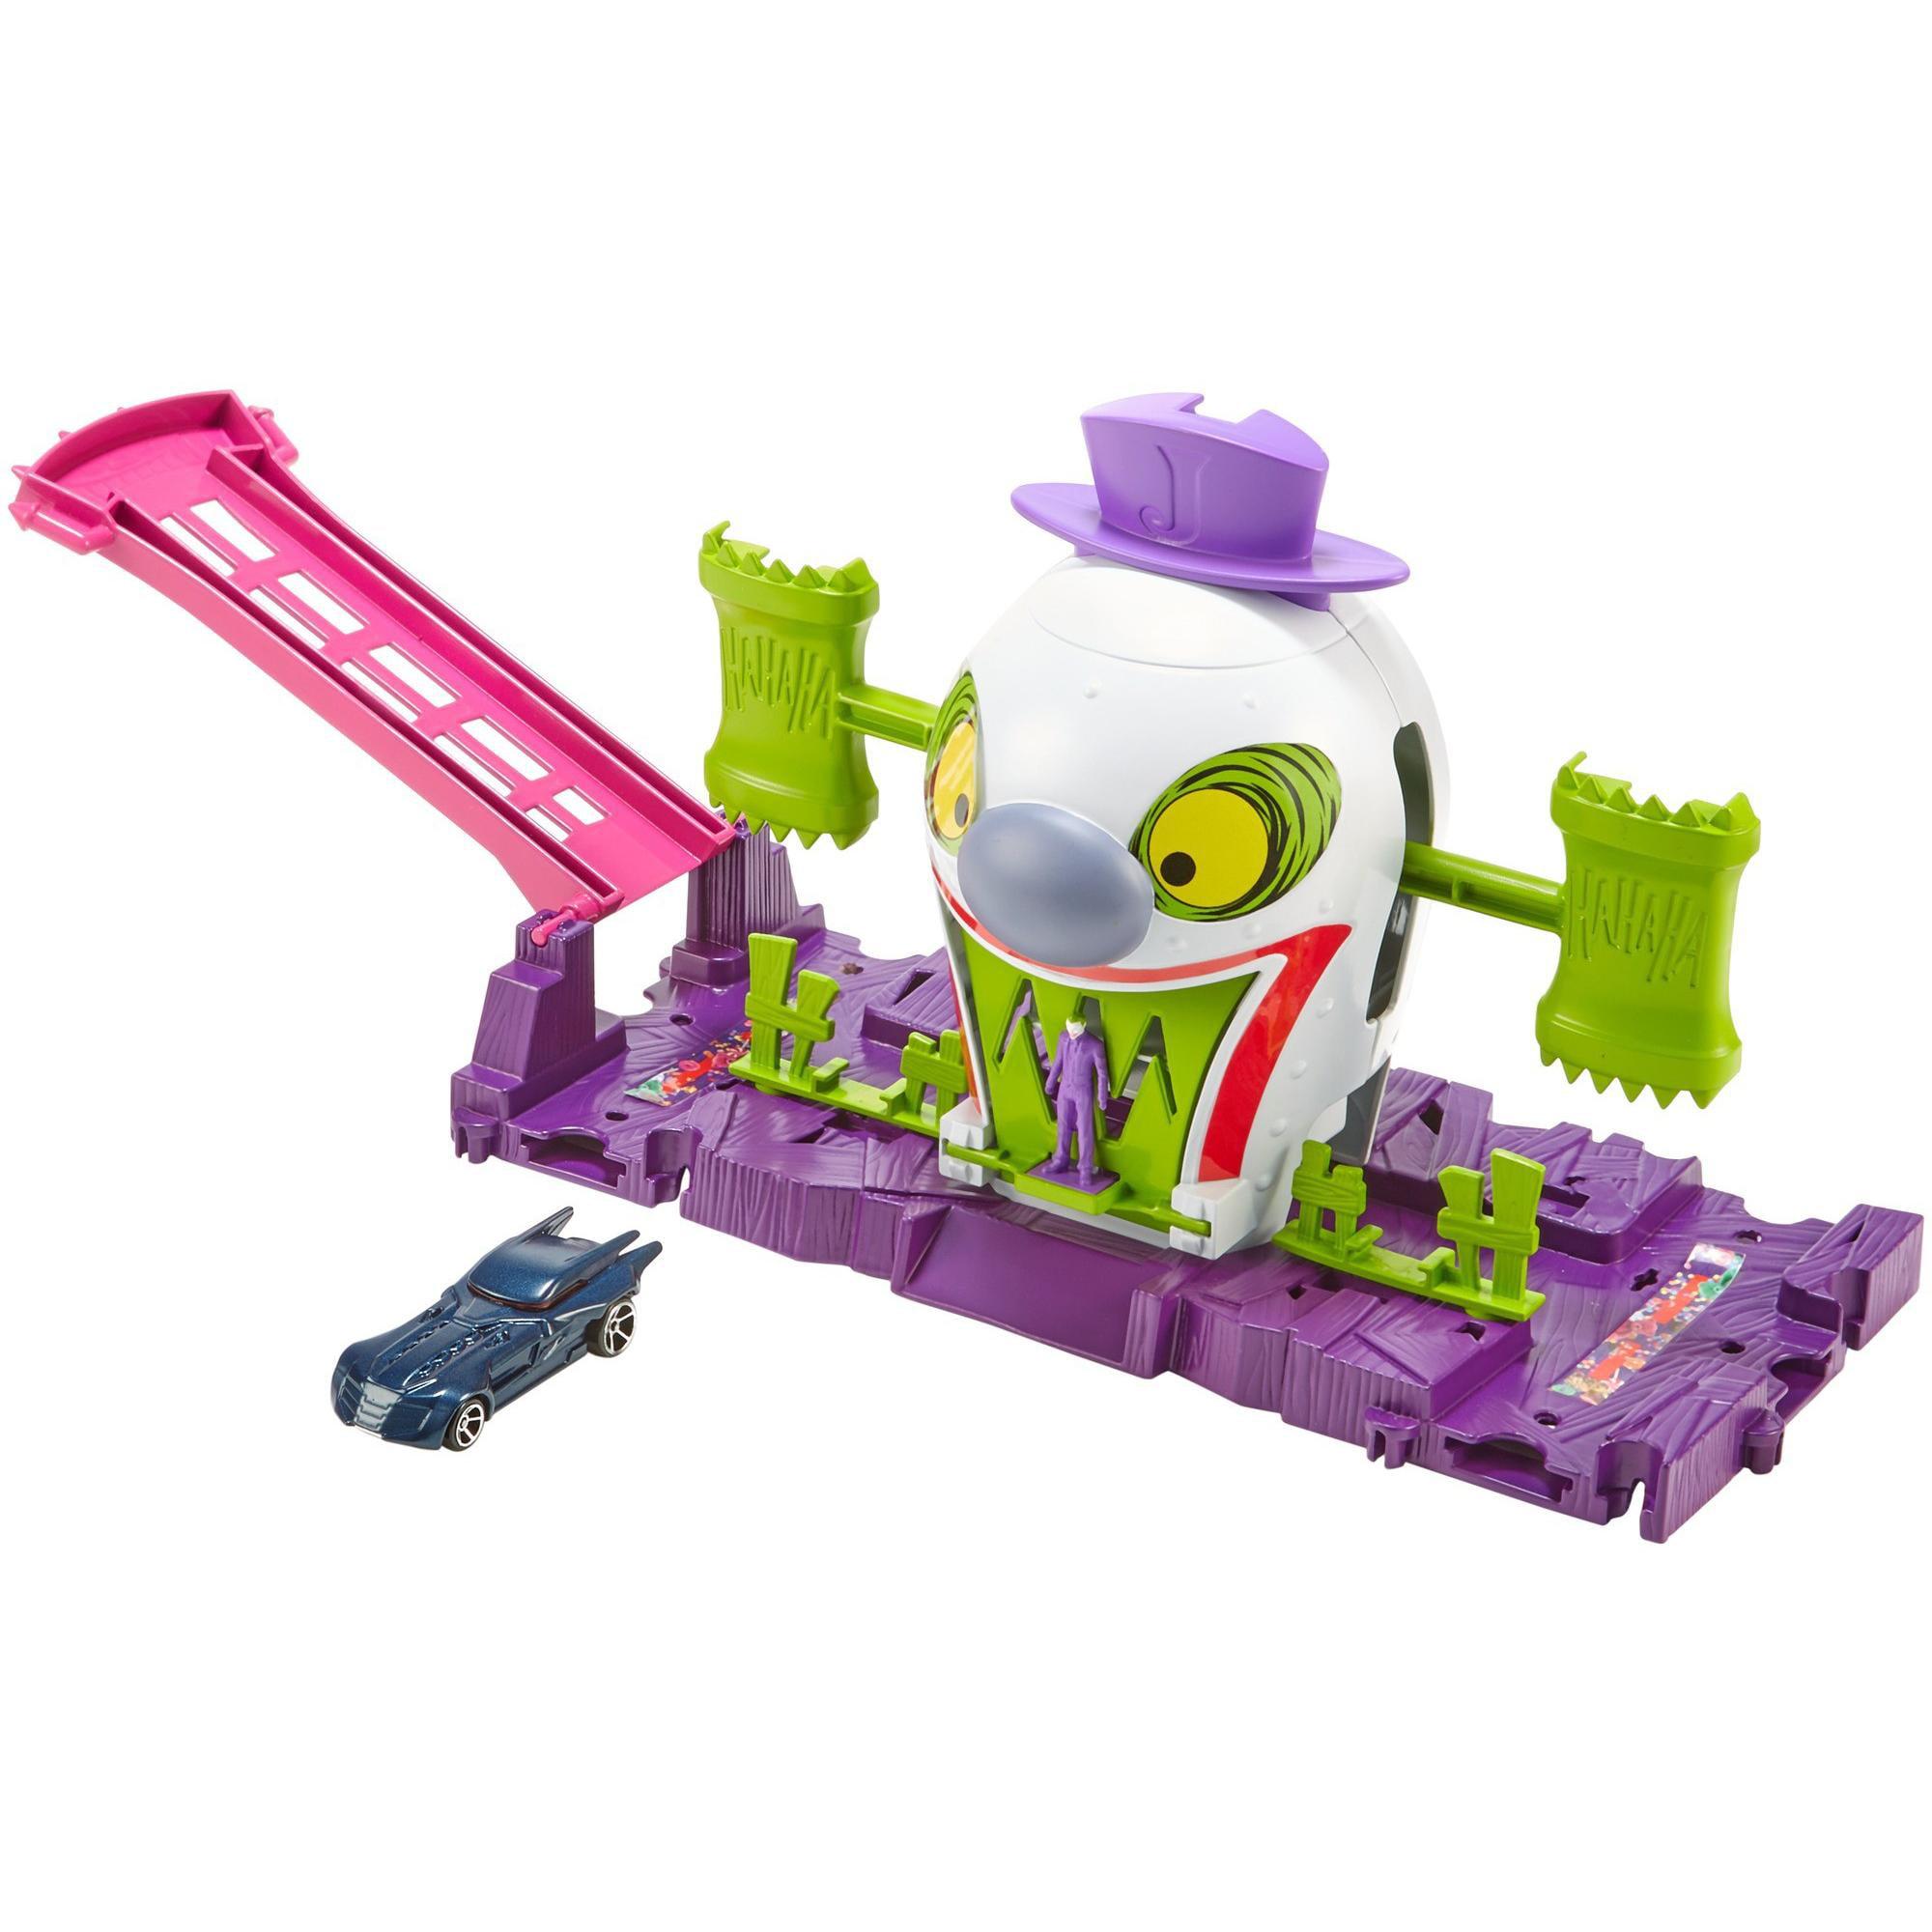 Hot Wheels DC Comics The Joker Funhouse Adventure Playset